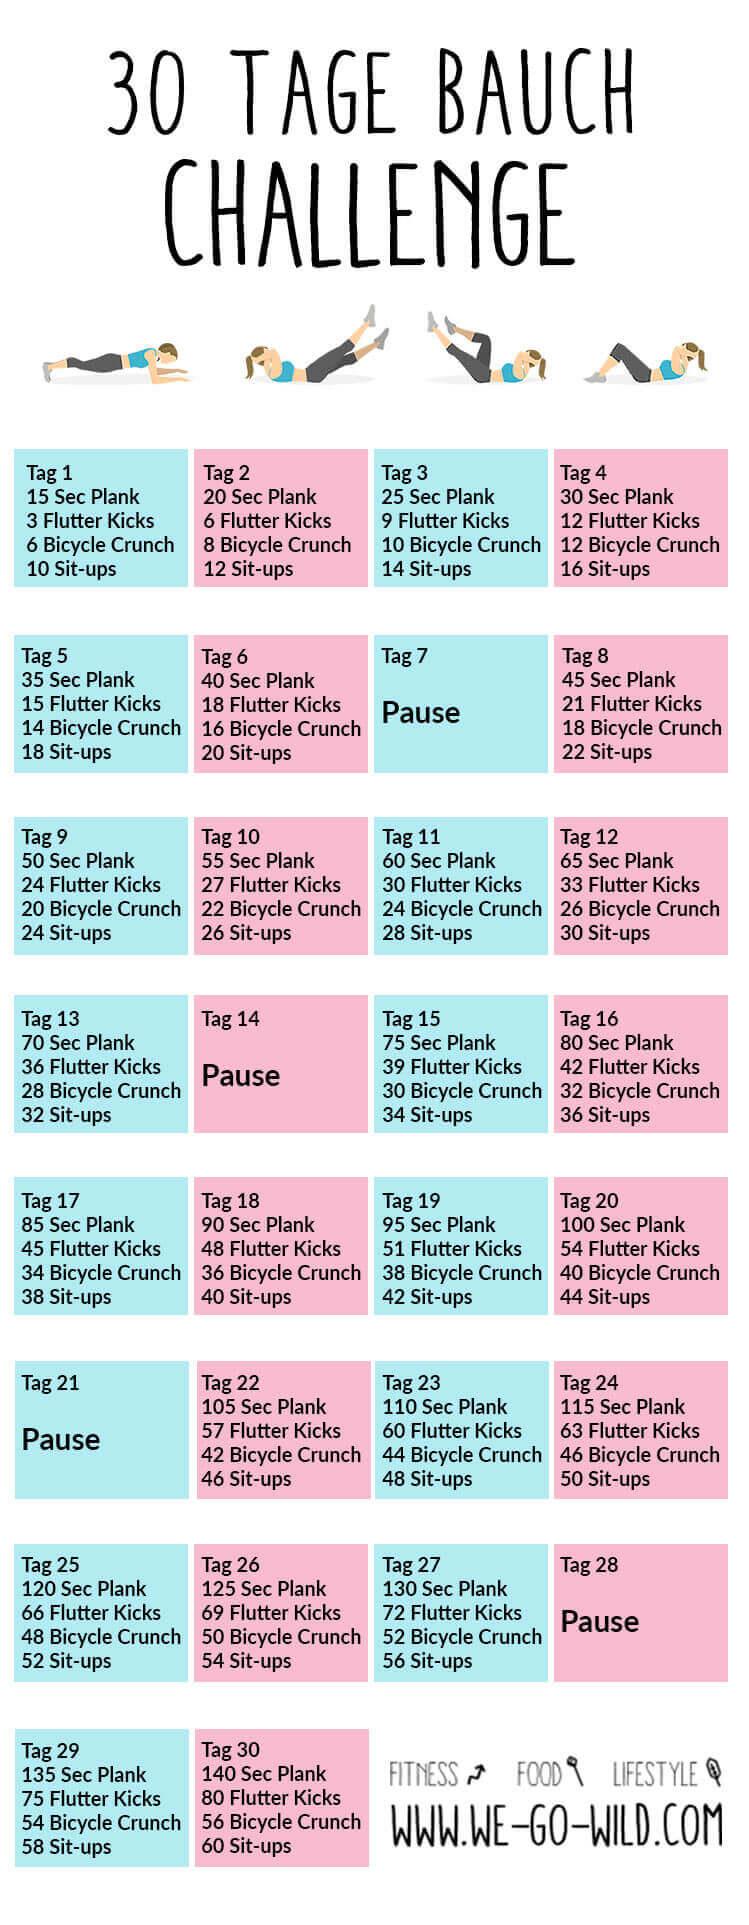 30 Tage Bauch Challenge Pdf